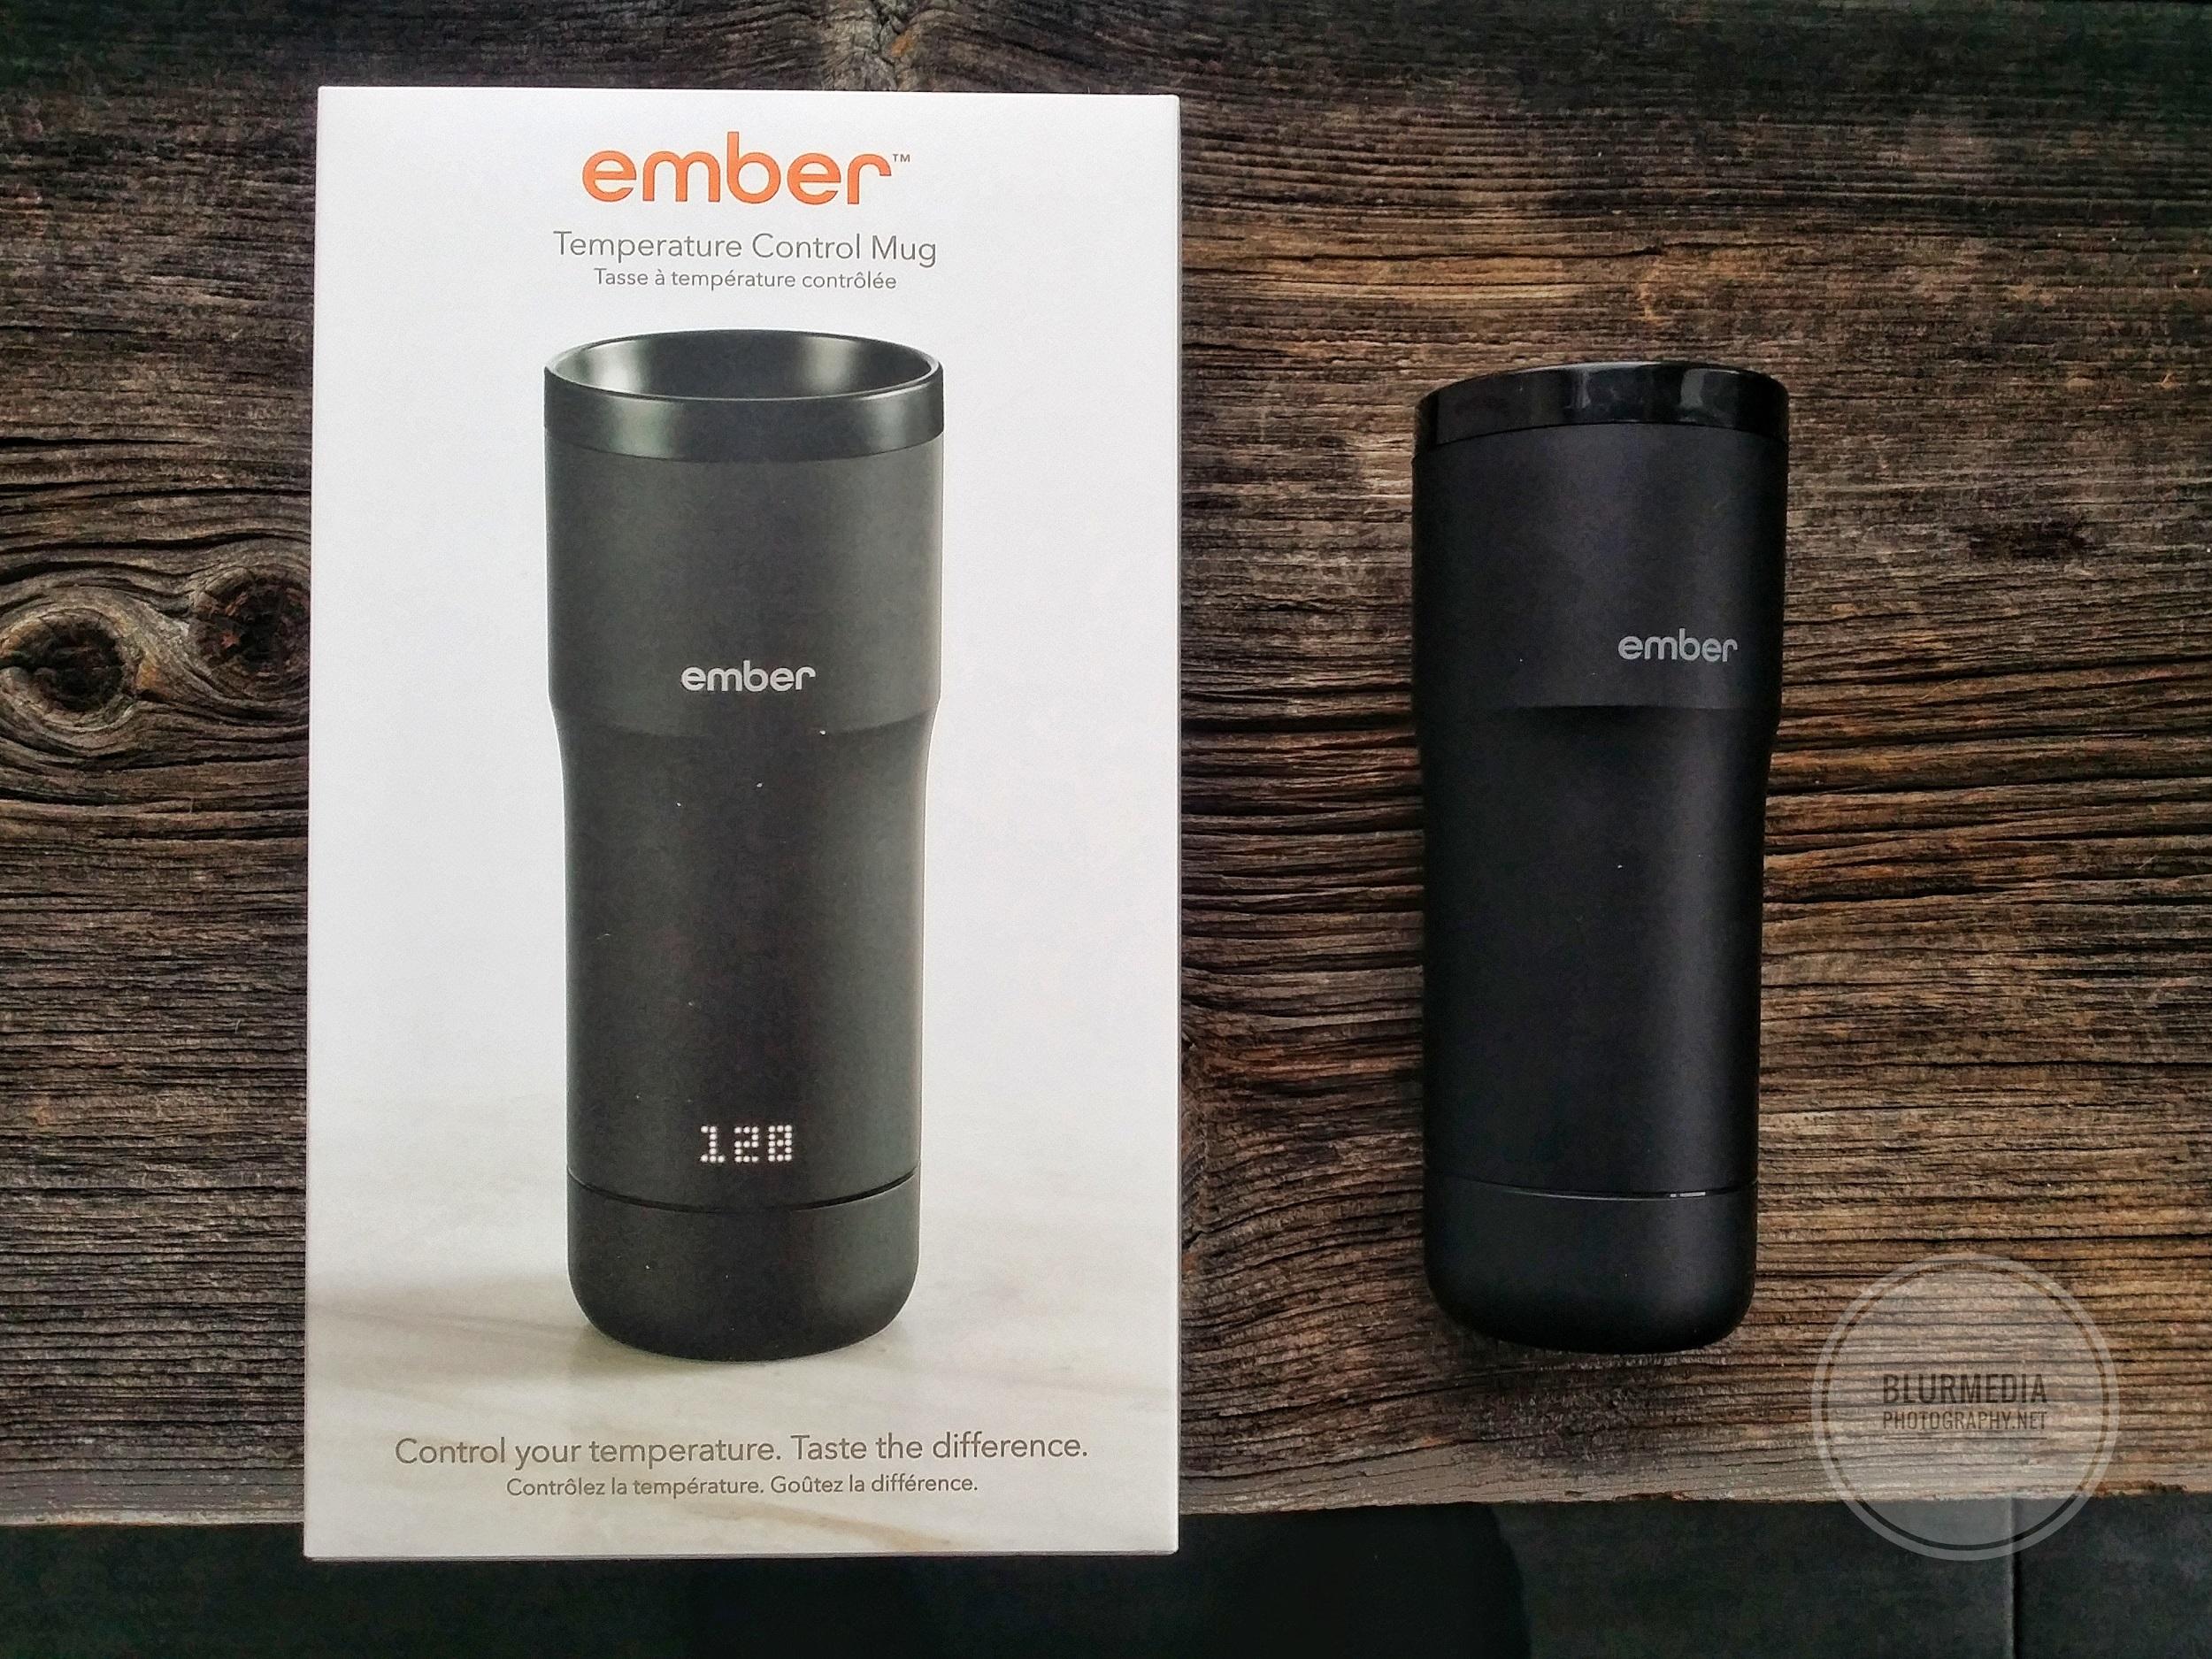 f9292ab13ed Ember Temperature Control Travel Mug Review - Is An Ember Mug Worth ...